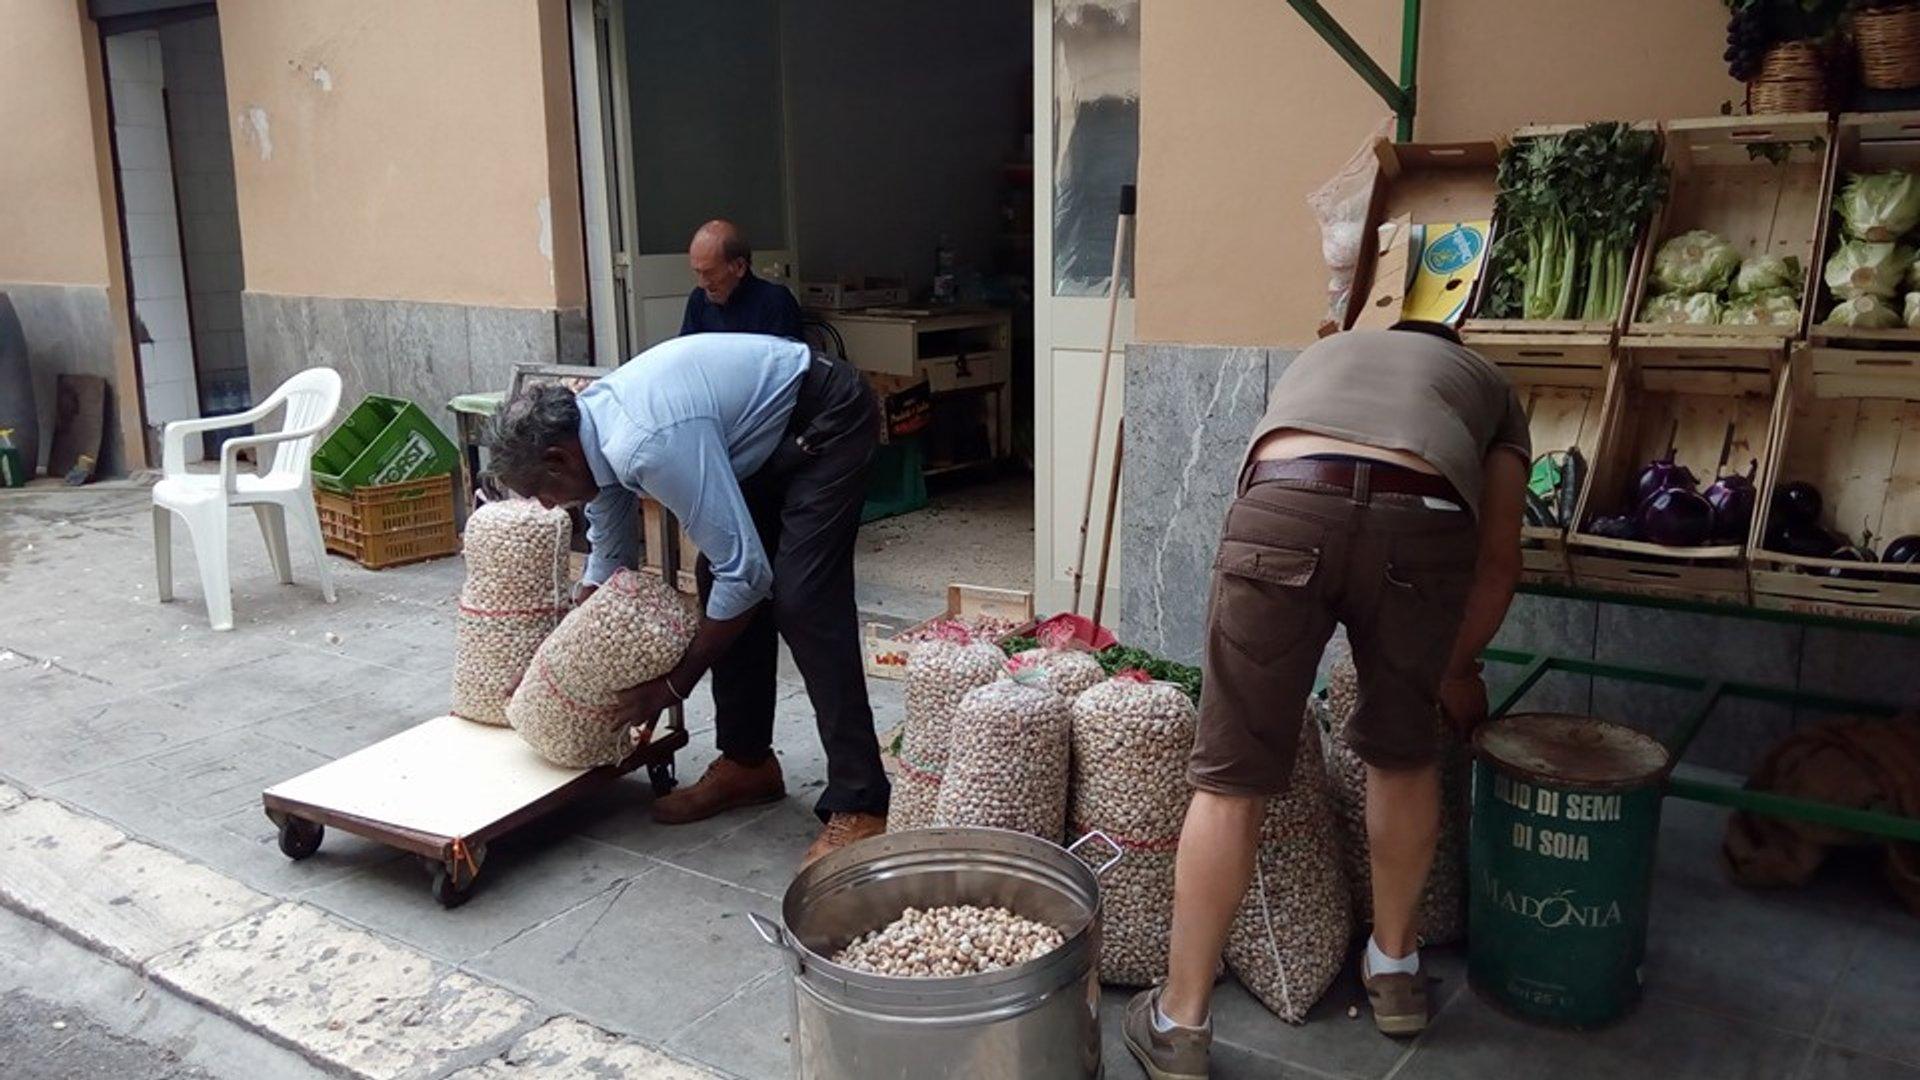 Snails or Babbaluci in Sicily - Best Season 2020